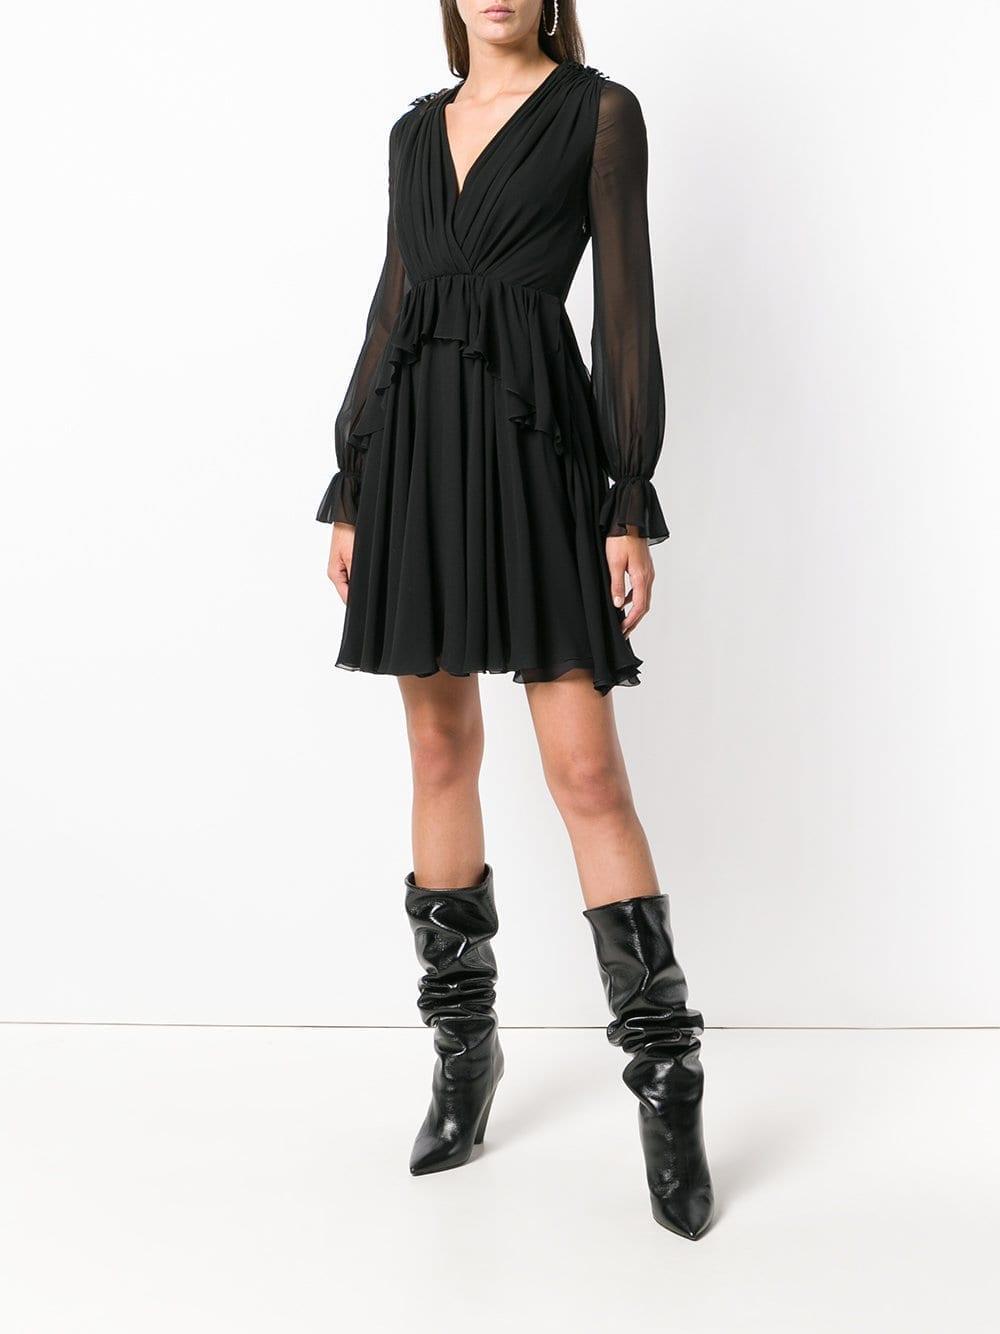 GIAMBATTISTA VALLI Ruffle Mini Black Dress